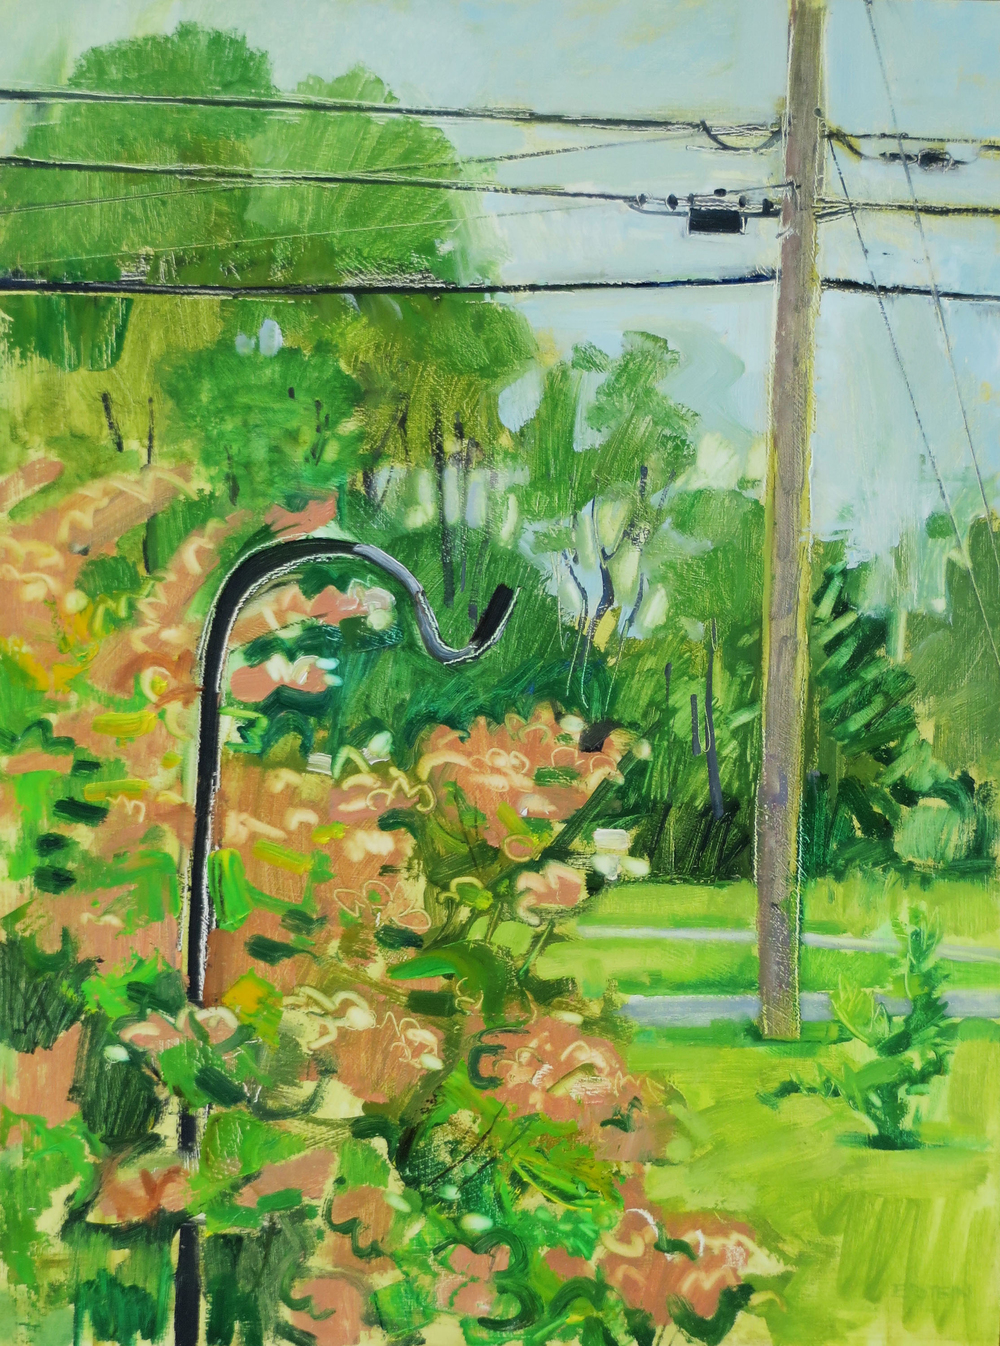 Shepherd's Hook and Telephone Pole